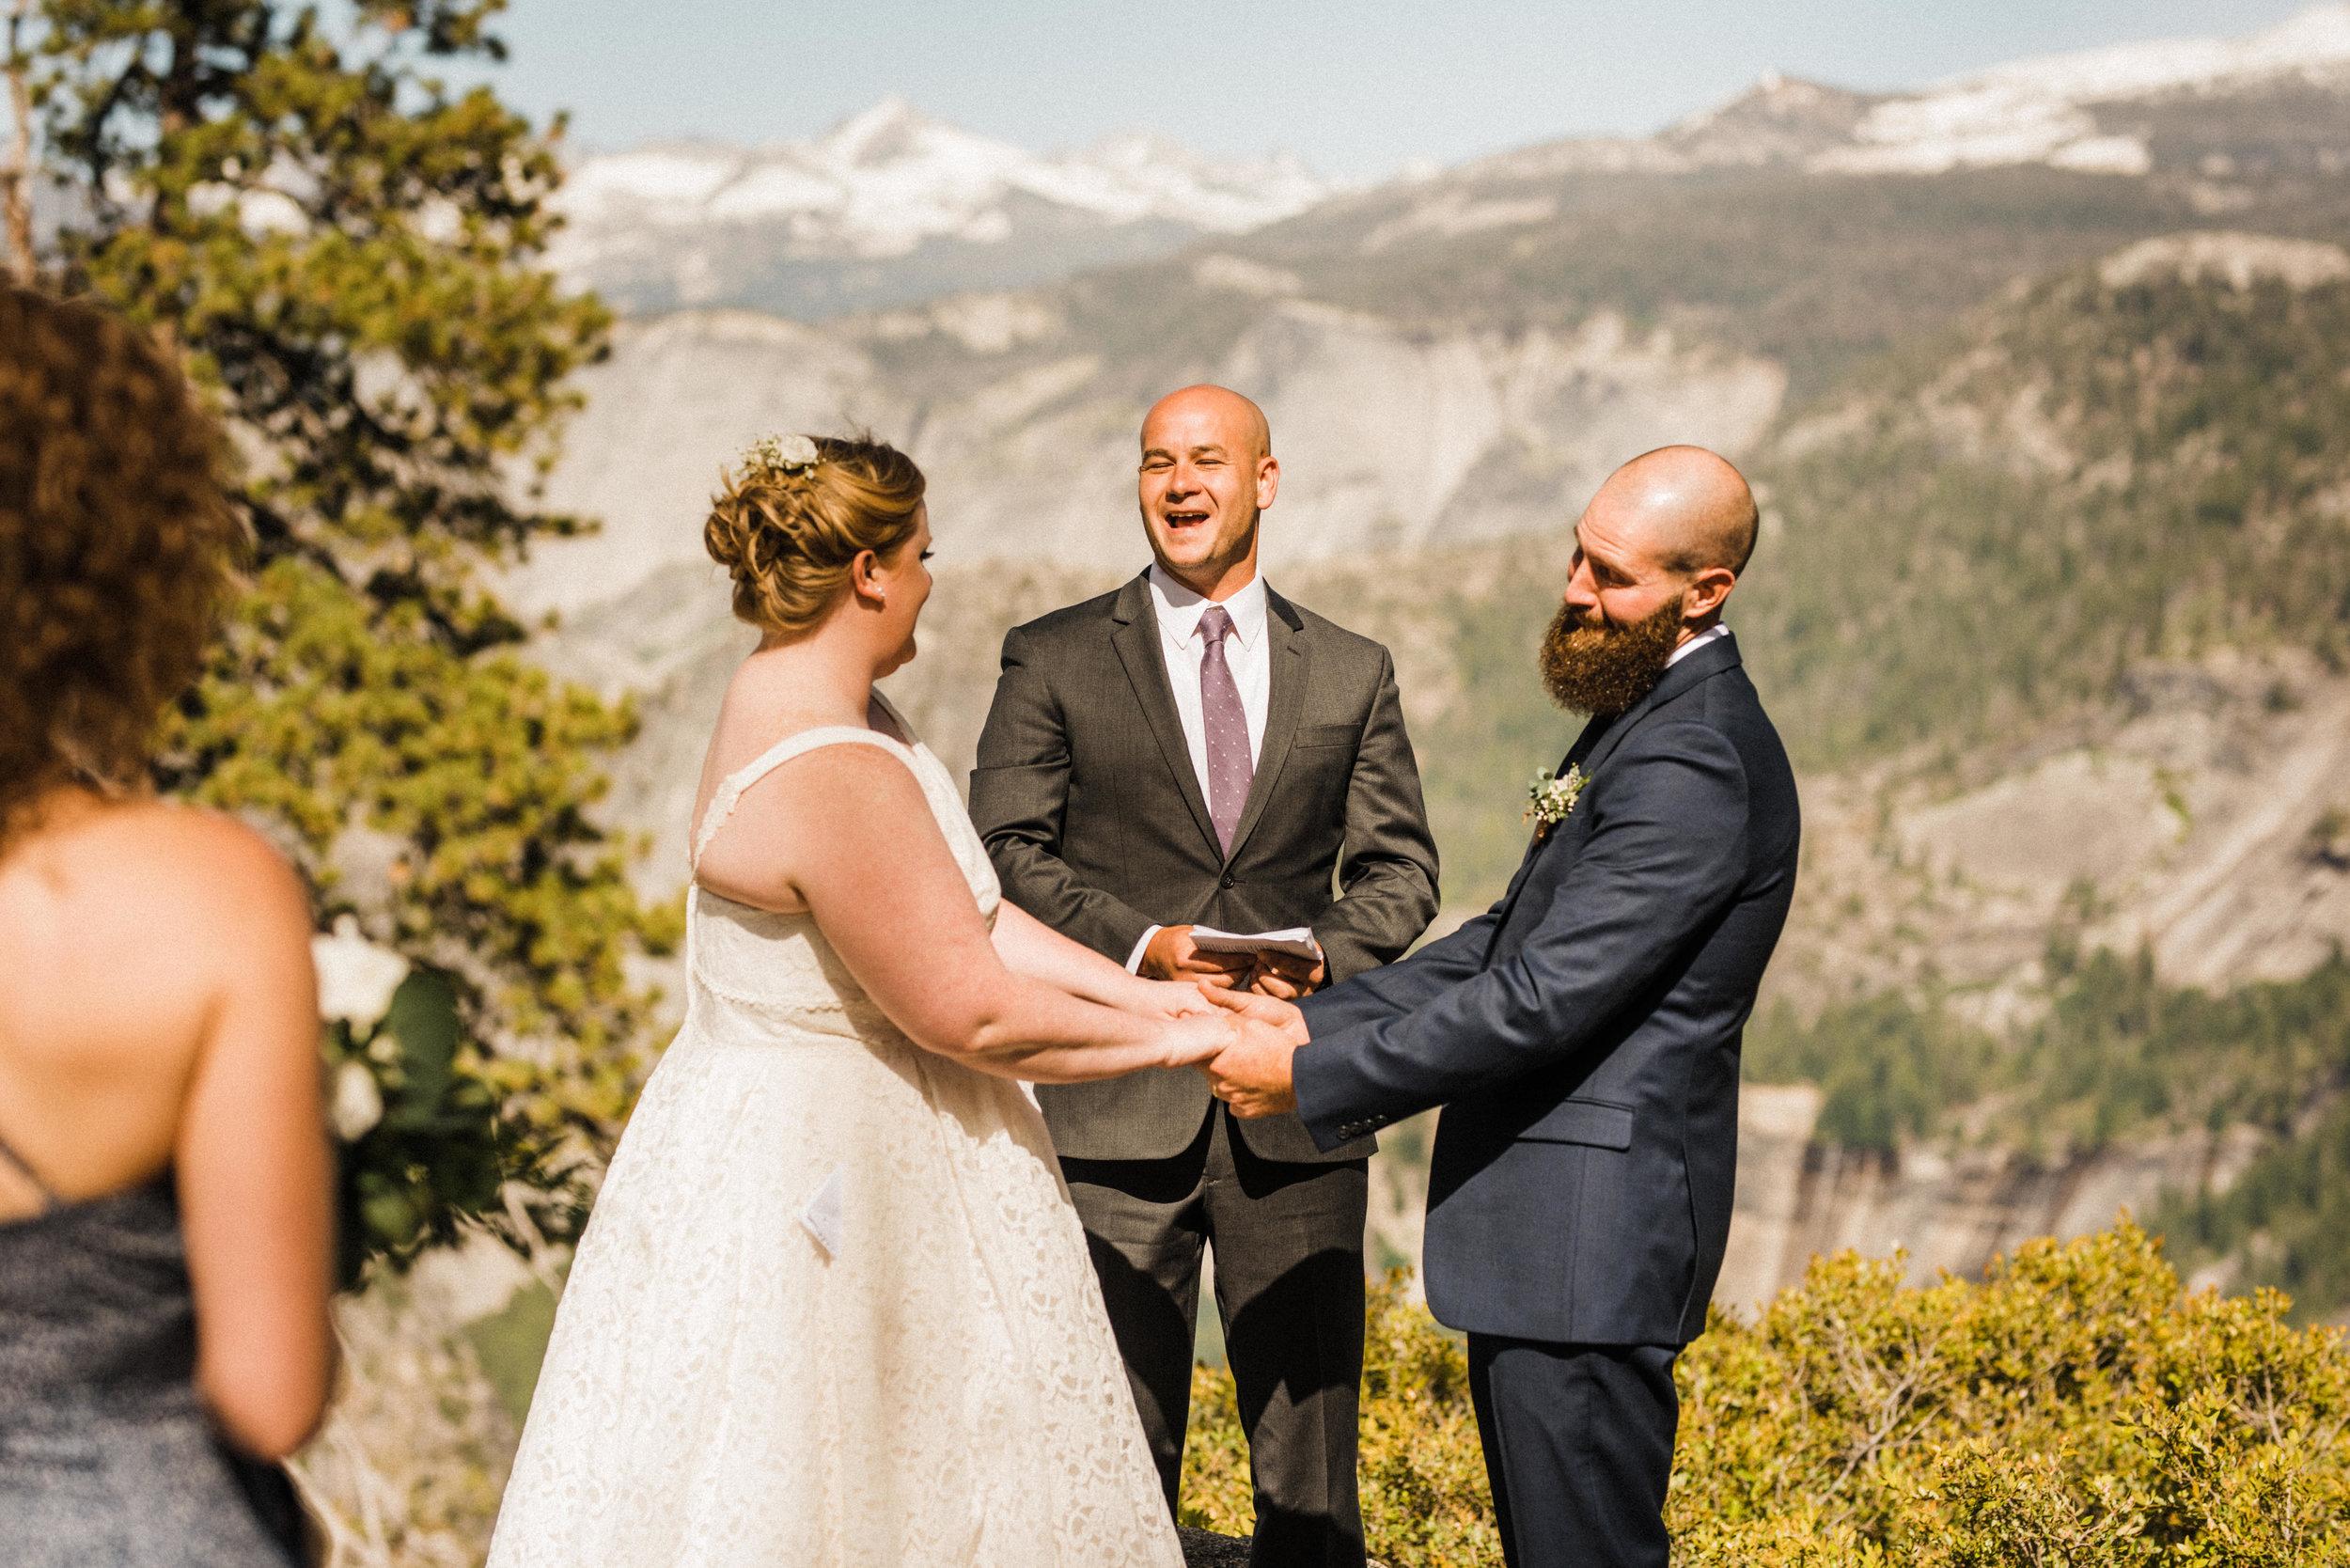 Ceremony at Glacier Point in Yosemite National Park